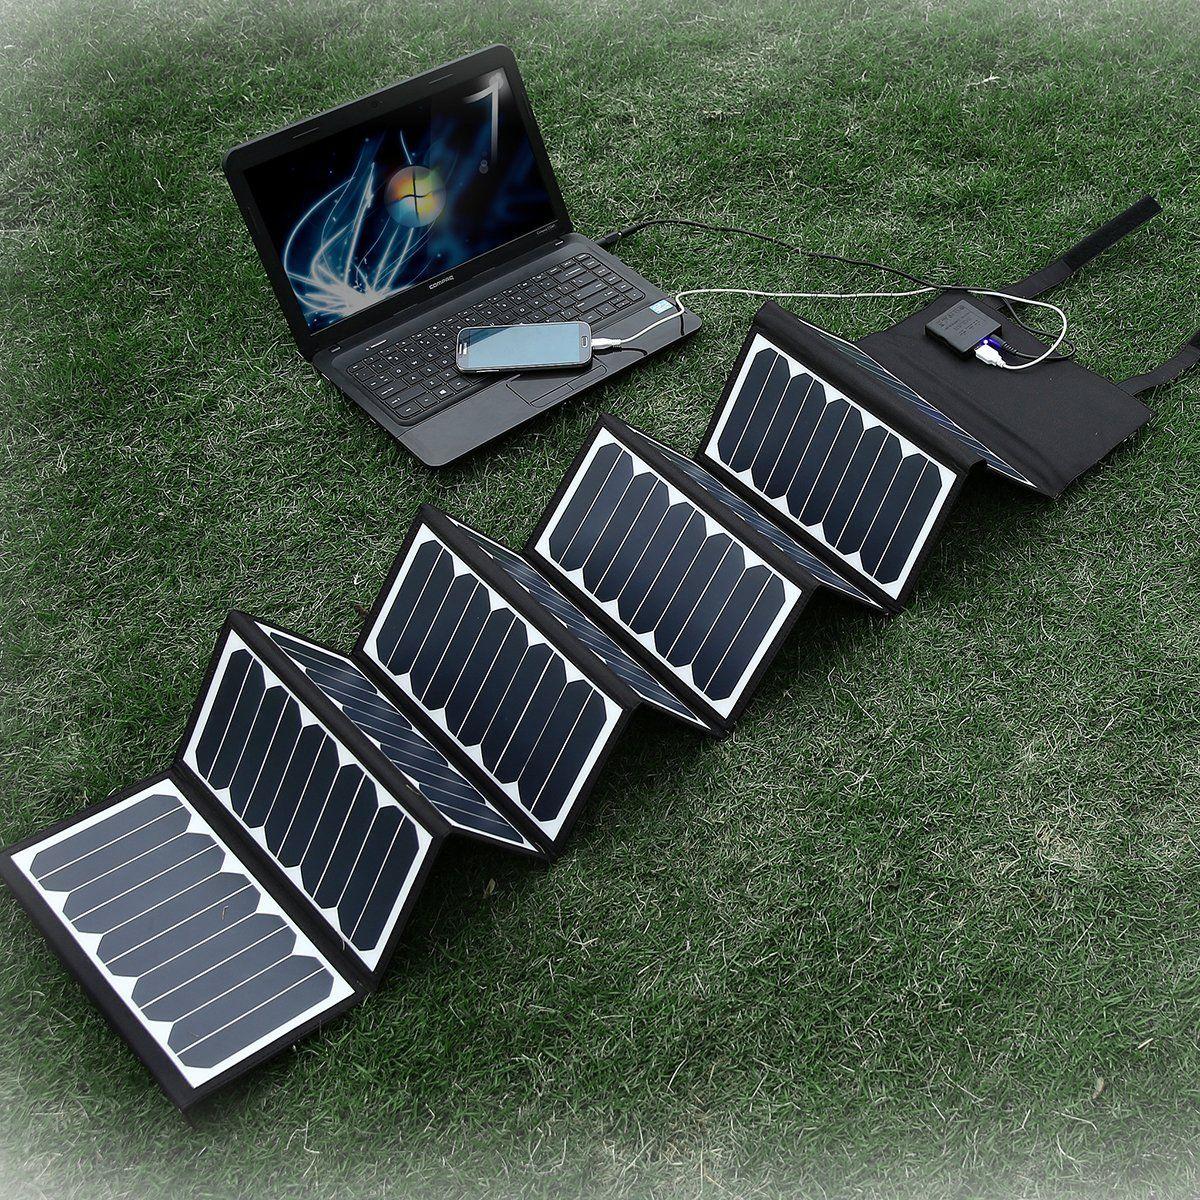 Poweradd High Efficient 60w Foldable Solar Panel Portable Solar Charger Usb Port 5v 2a Dc Output 18v 2 2a Ma Solar Panel Charger Solar Panels Solar Charger